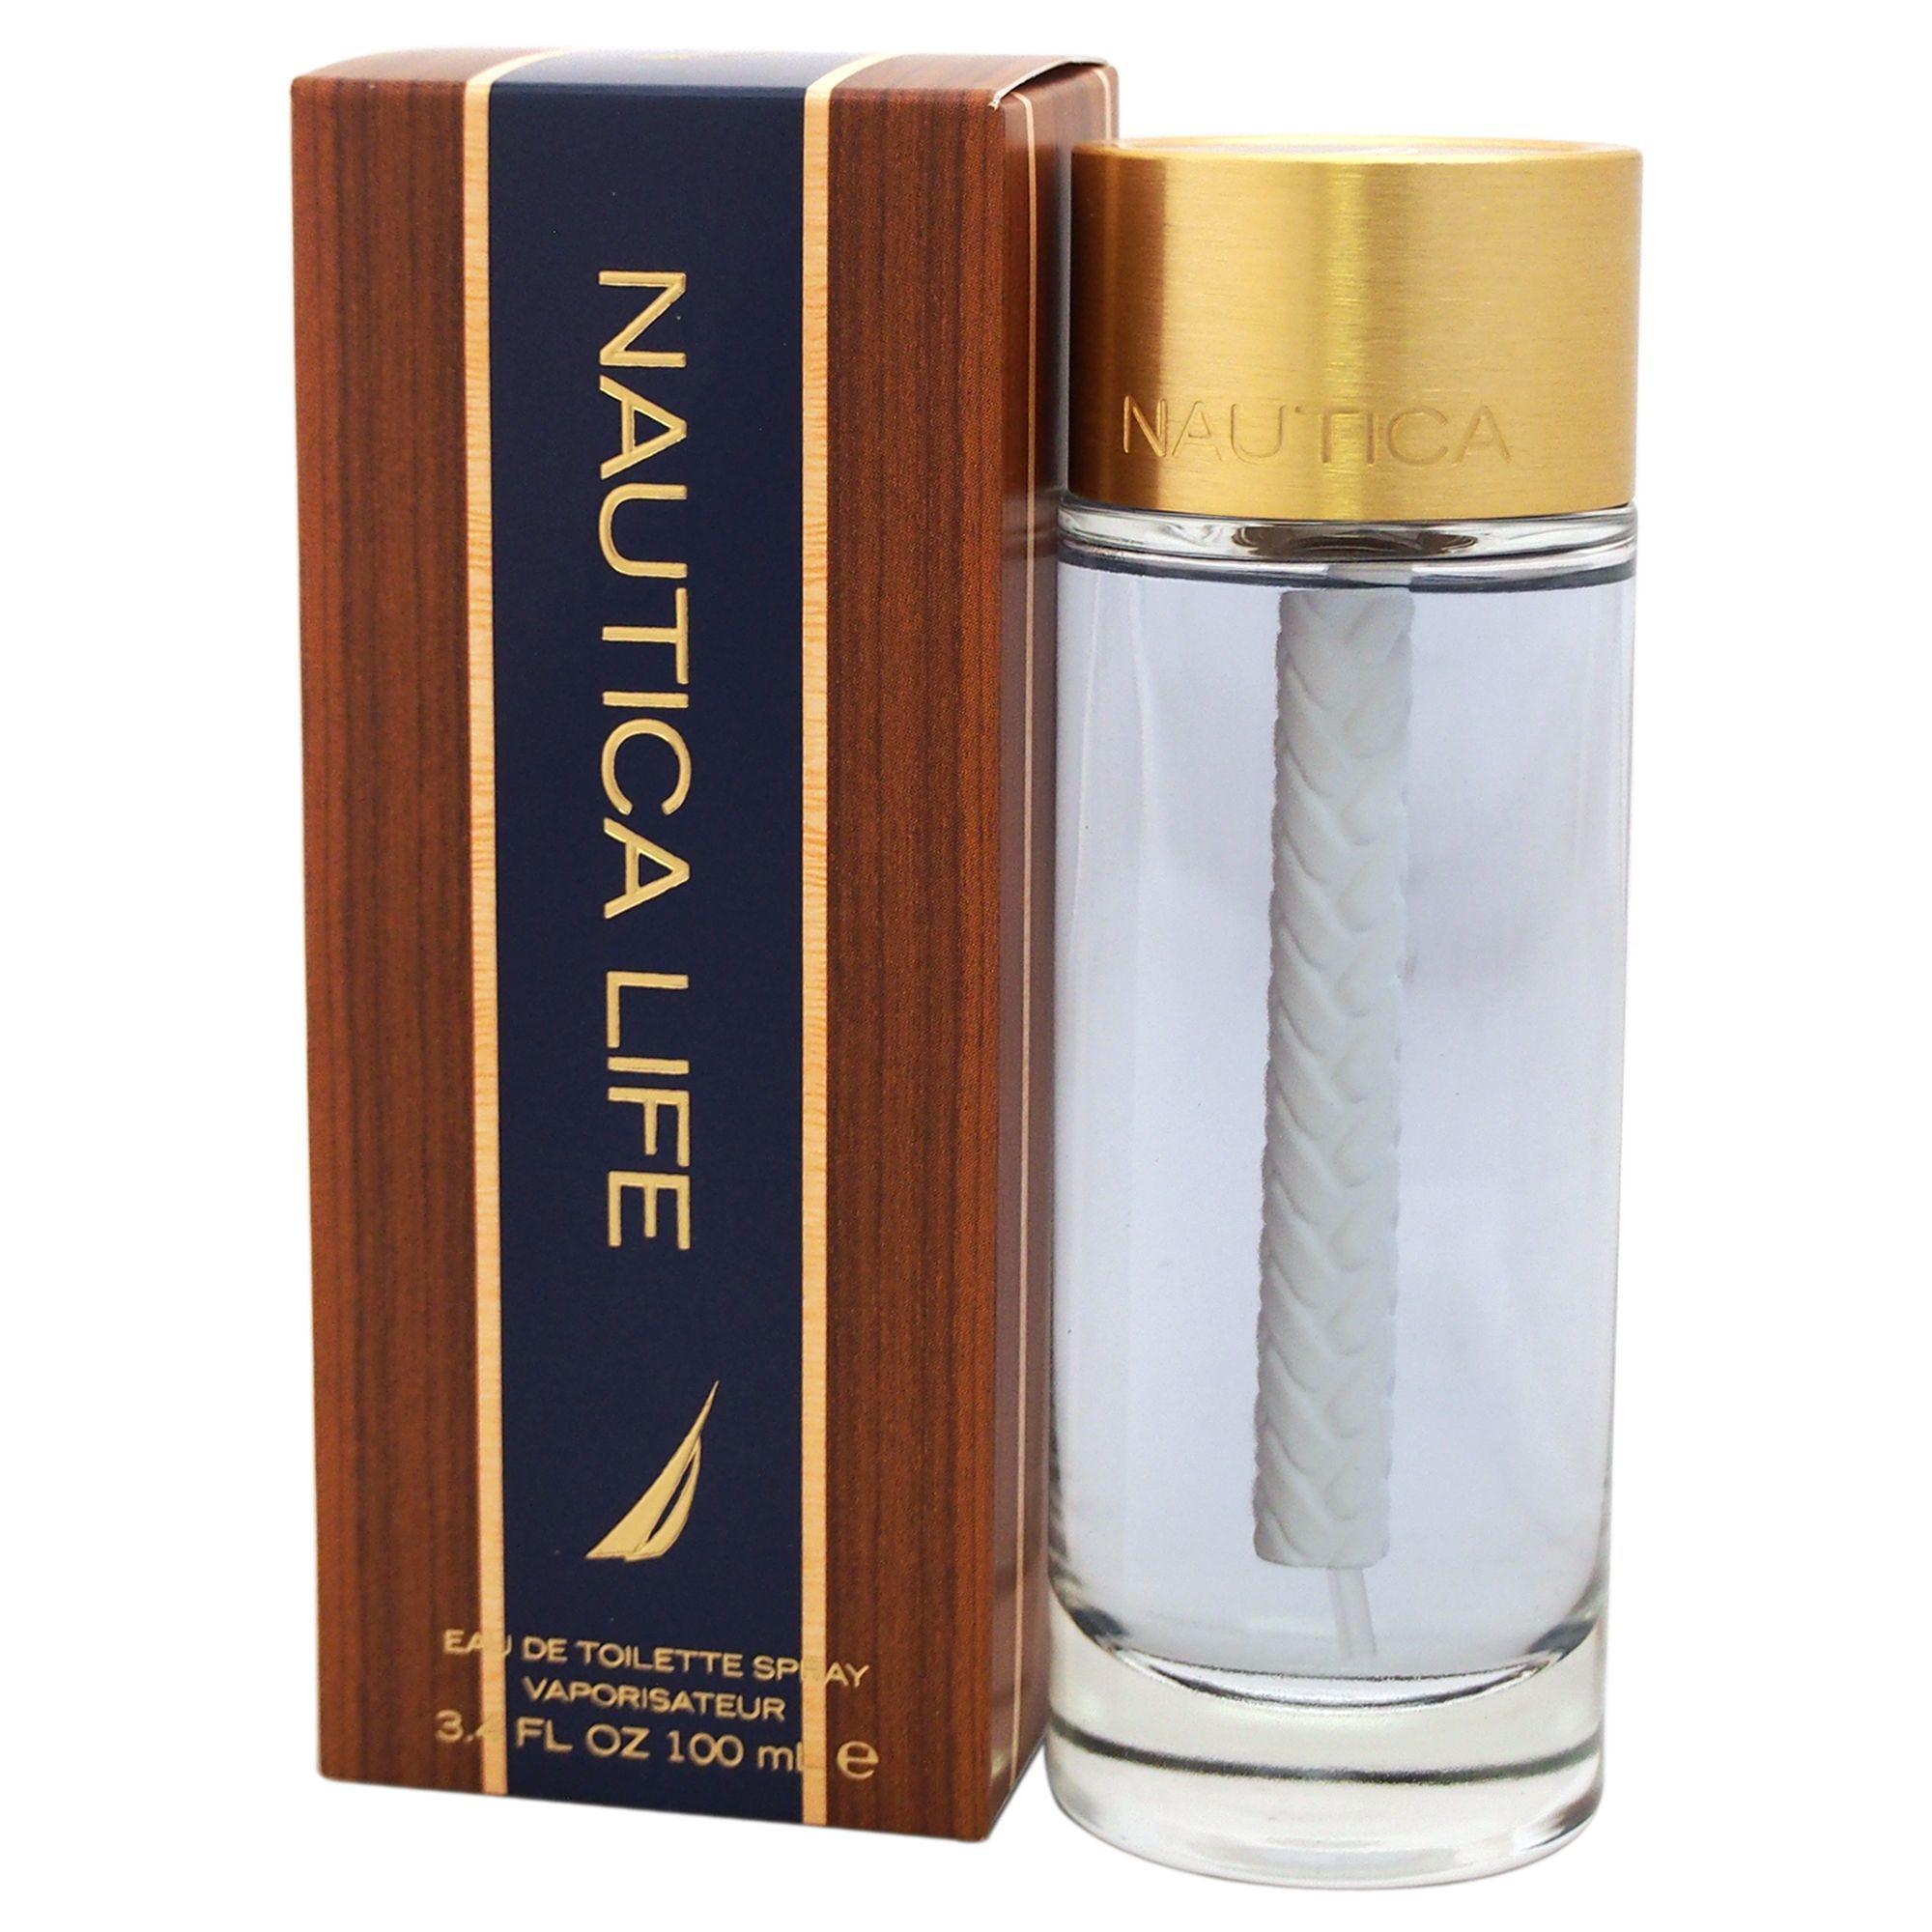 Nautica Nautica Life Eau de Toilette 100ml Spray